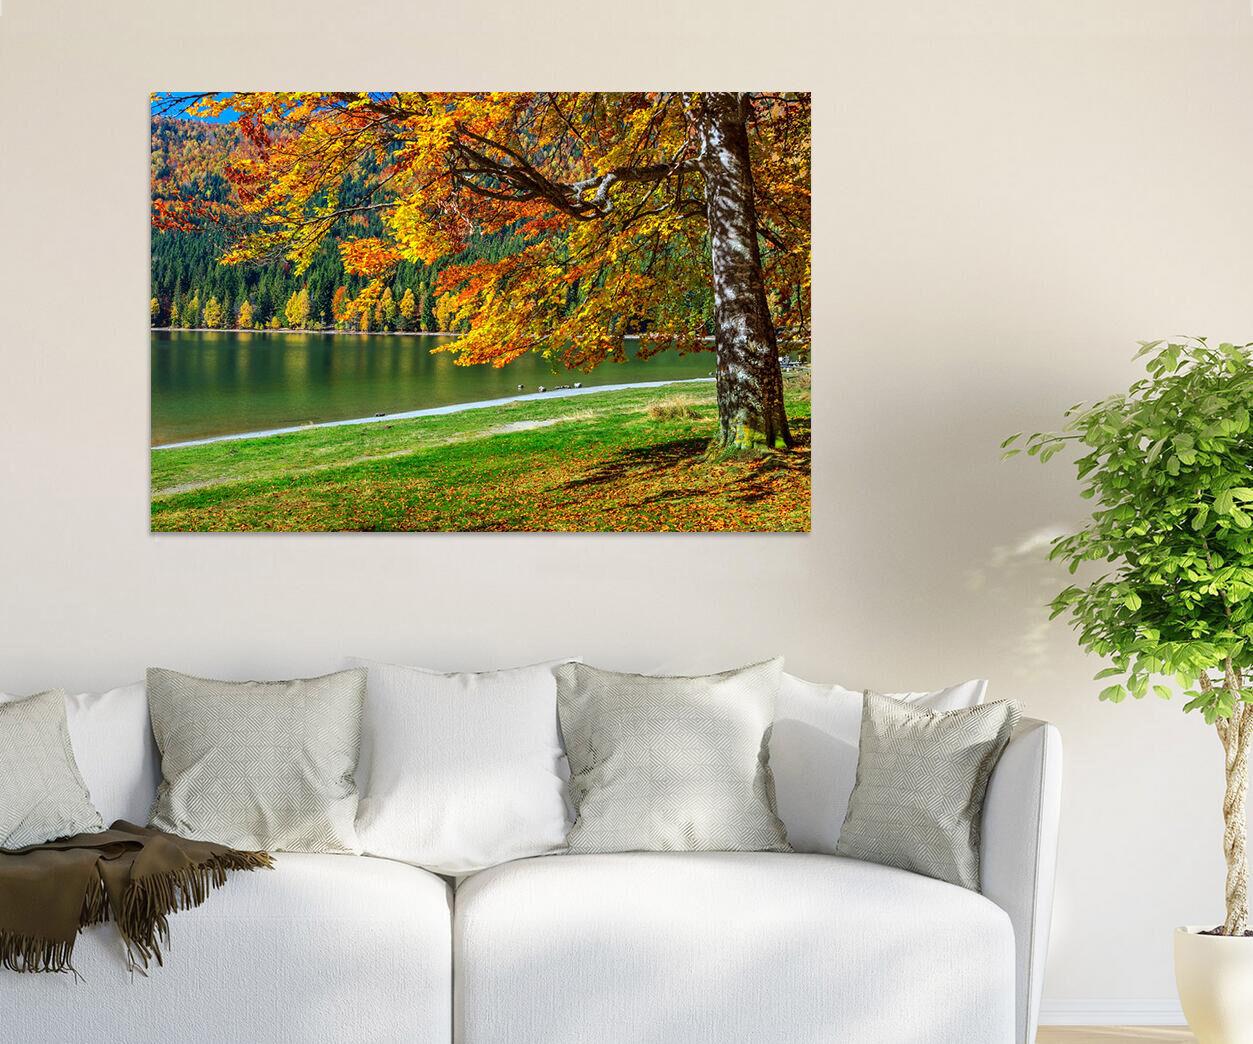 3D Goldener Baum Wiese Fluss 85 Fototapeten Wandbild BildTapete AJSTORE DE Lemon